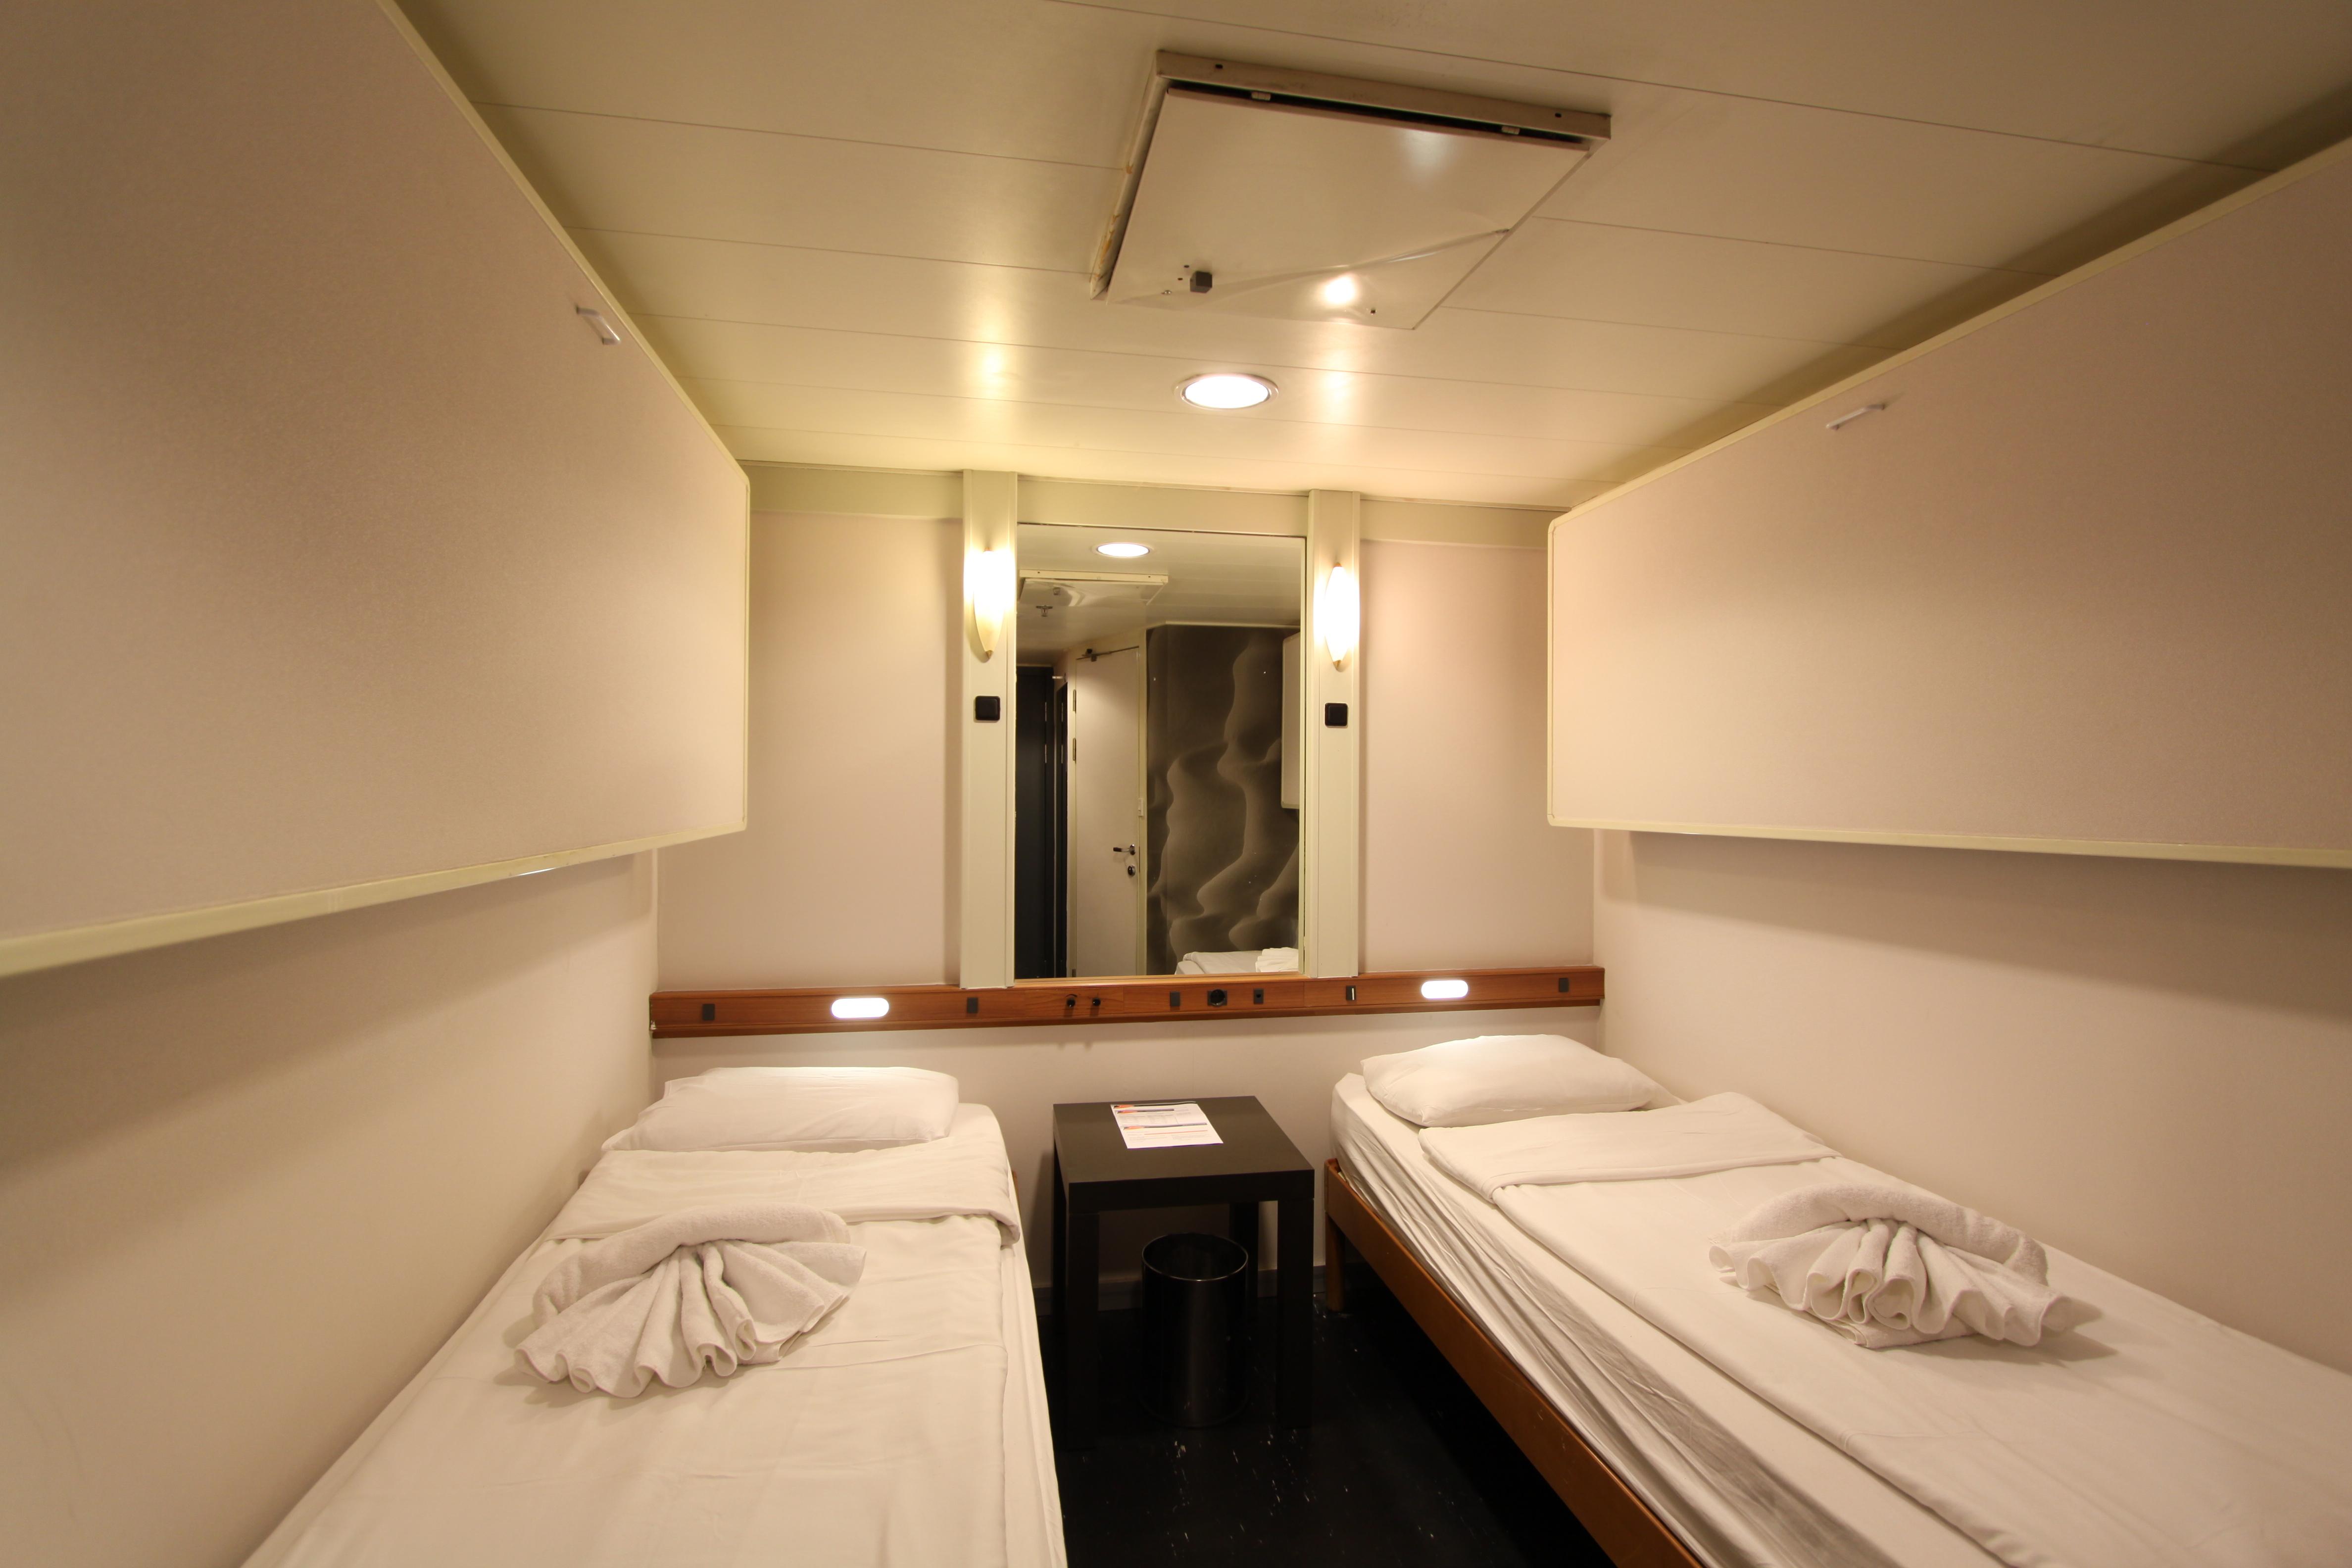 Ensuite Bathroom No Window cruises | cruise holidays 2017, 2018 & 2019 | cheap cruise deals